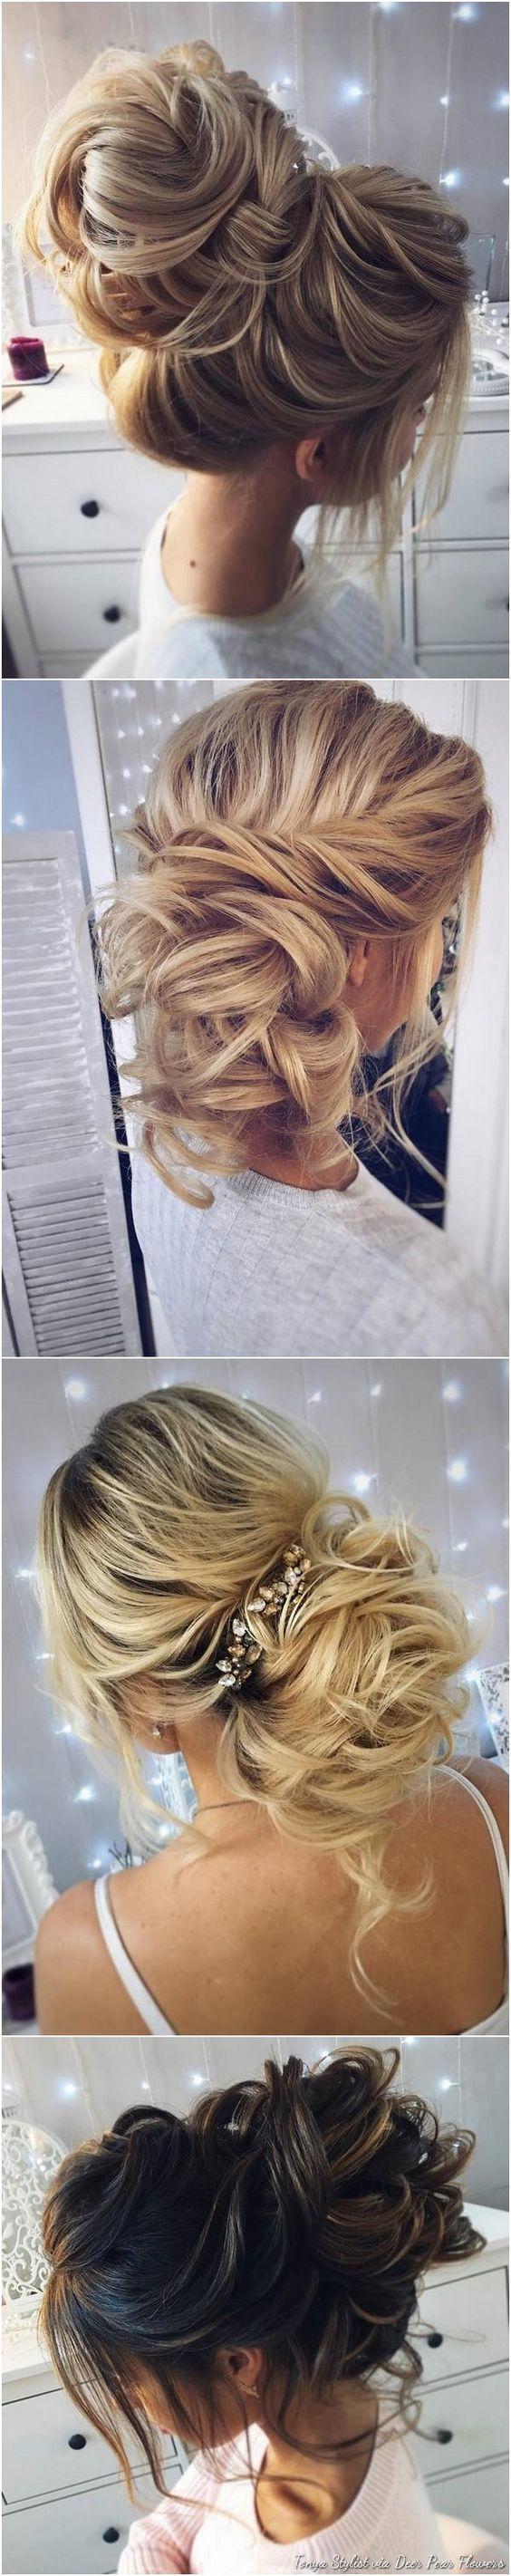 best kid wedding hair images on pinterest hairstyle ideas